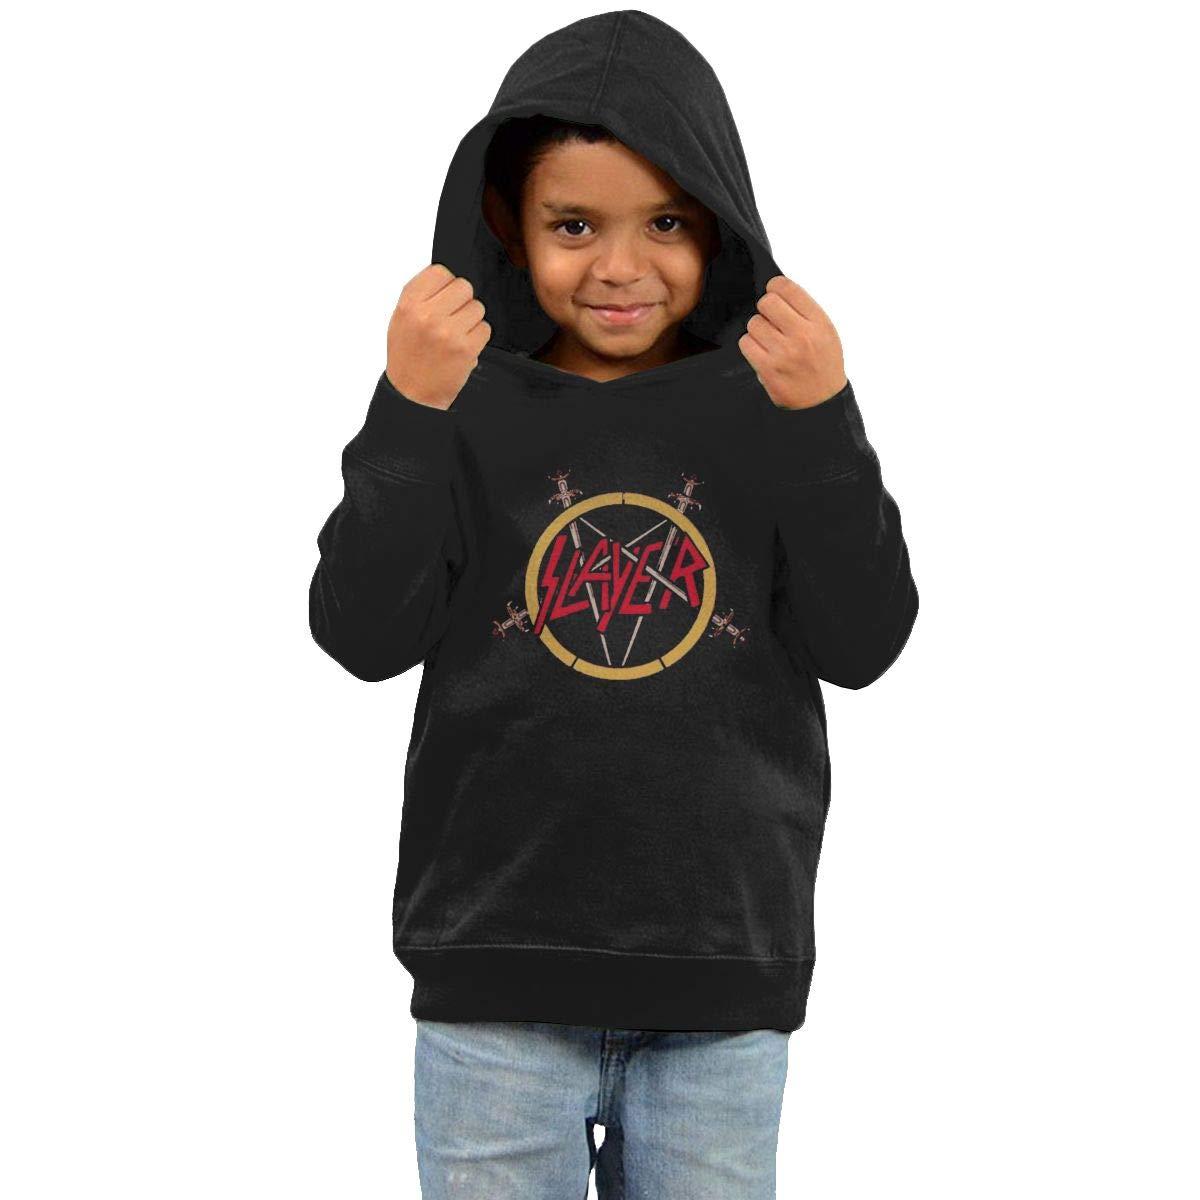 Stacy J. Payne Boys Slayer Rock Band Logo Funny Hoodie41 Black